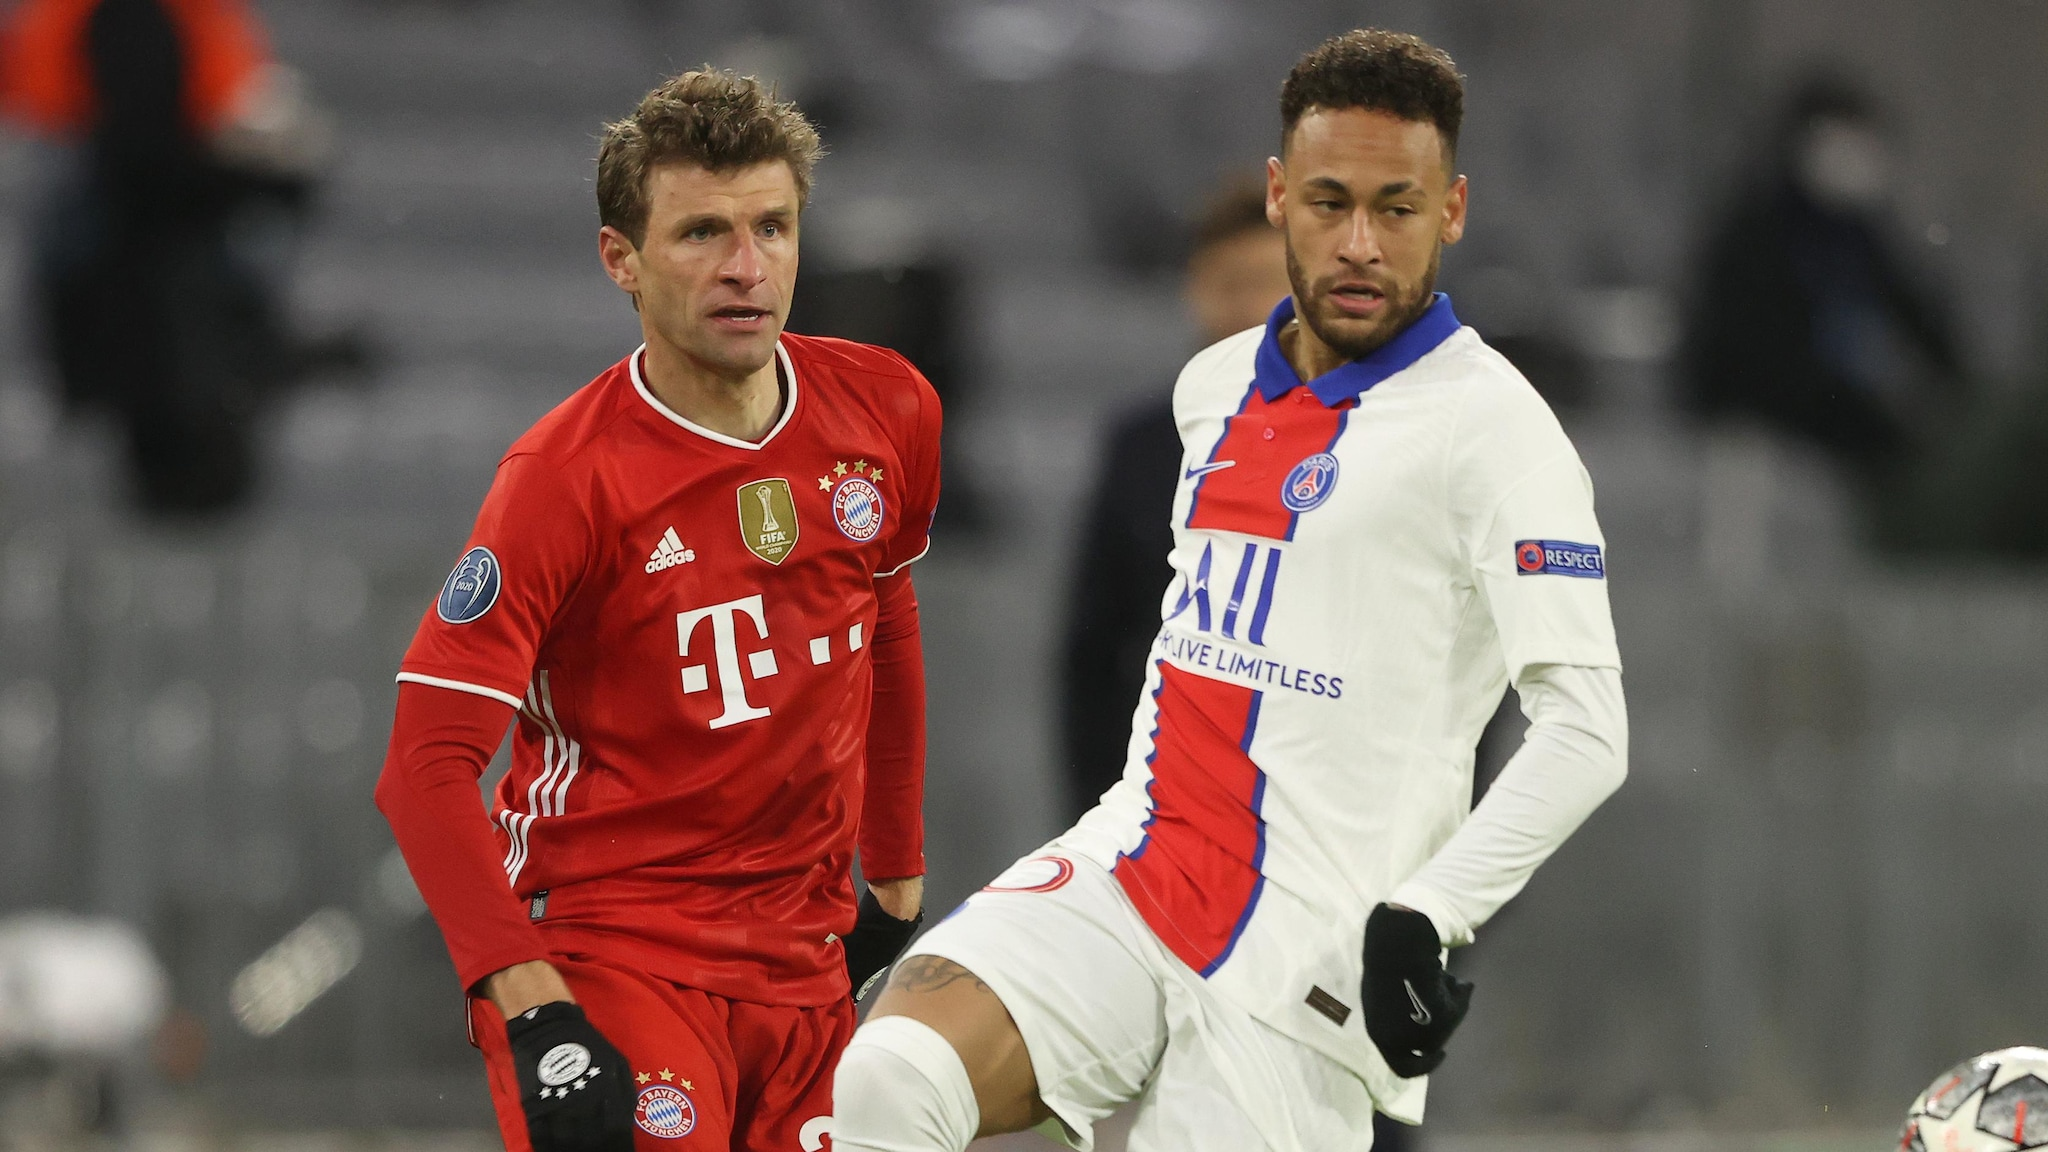 Paris-Bayern   Paris Saint-Germain vs Bayern München Champions League  preview: where to watch, predicted line-ups, team news   UEFA Champions  League   UEFA.com